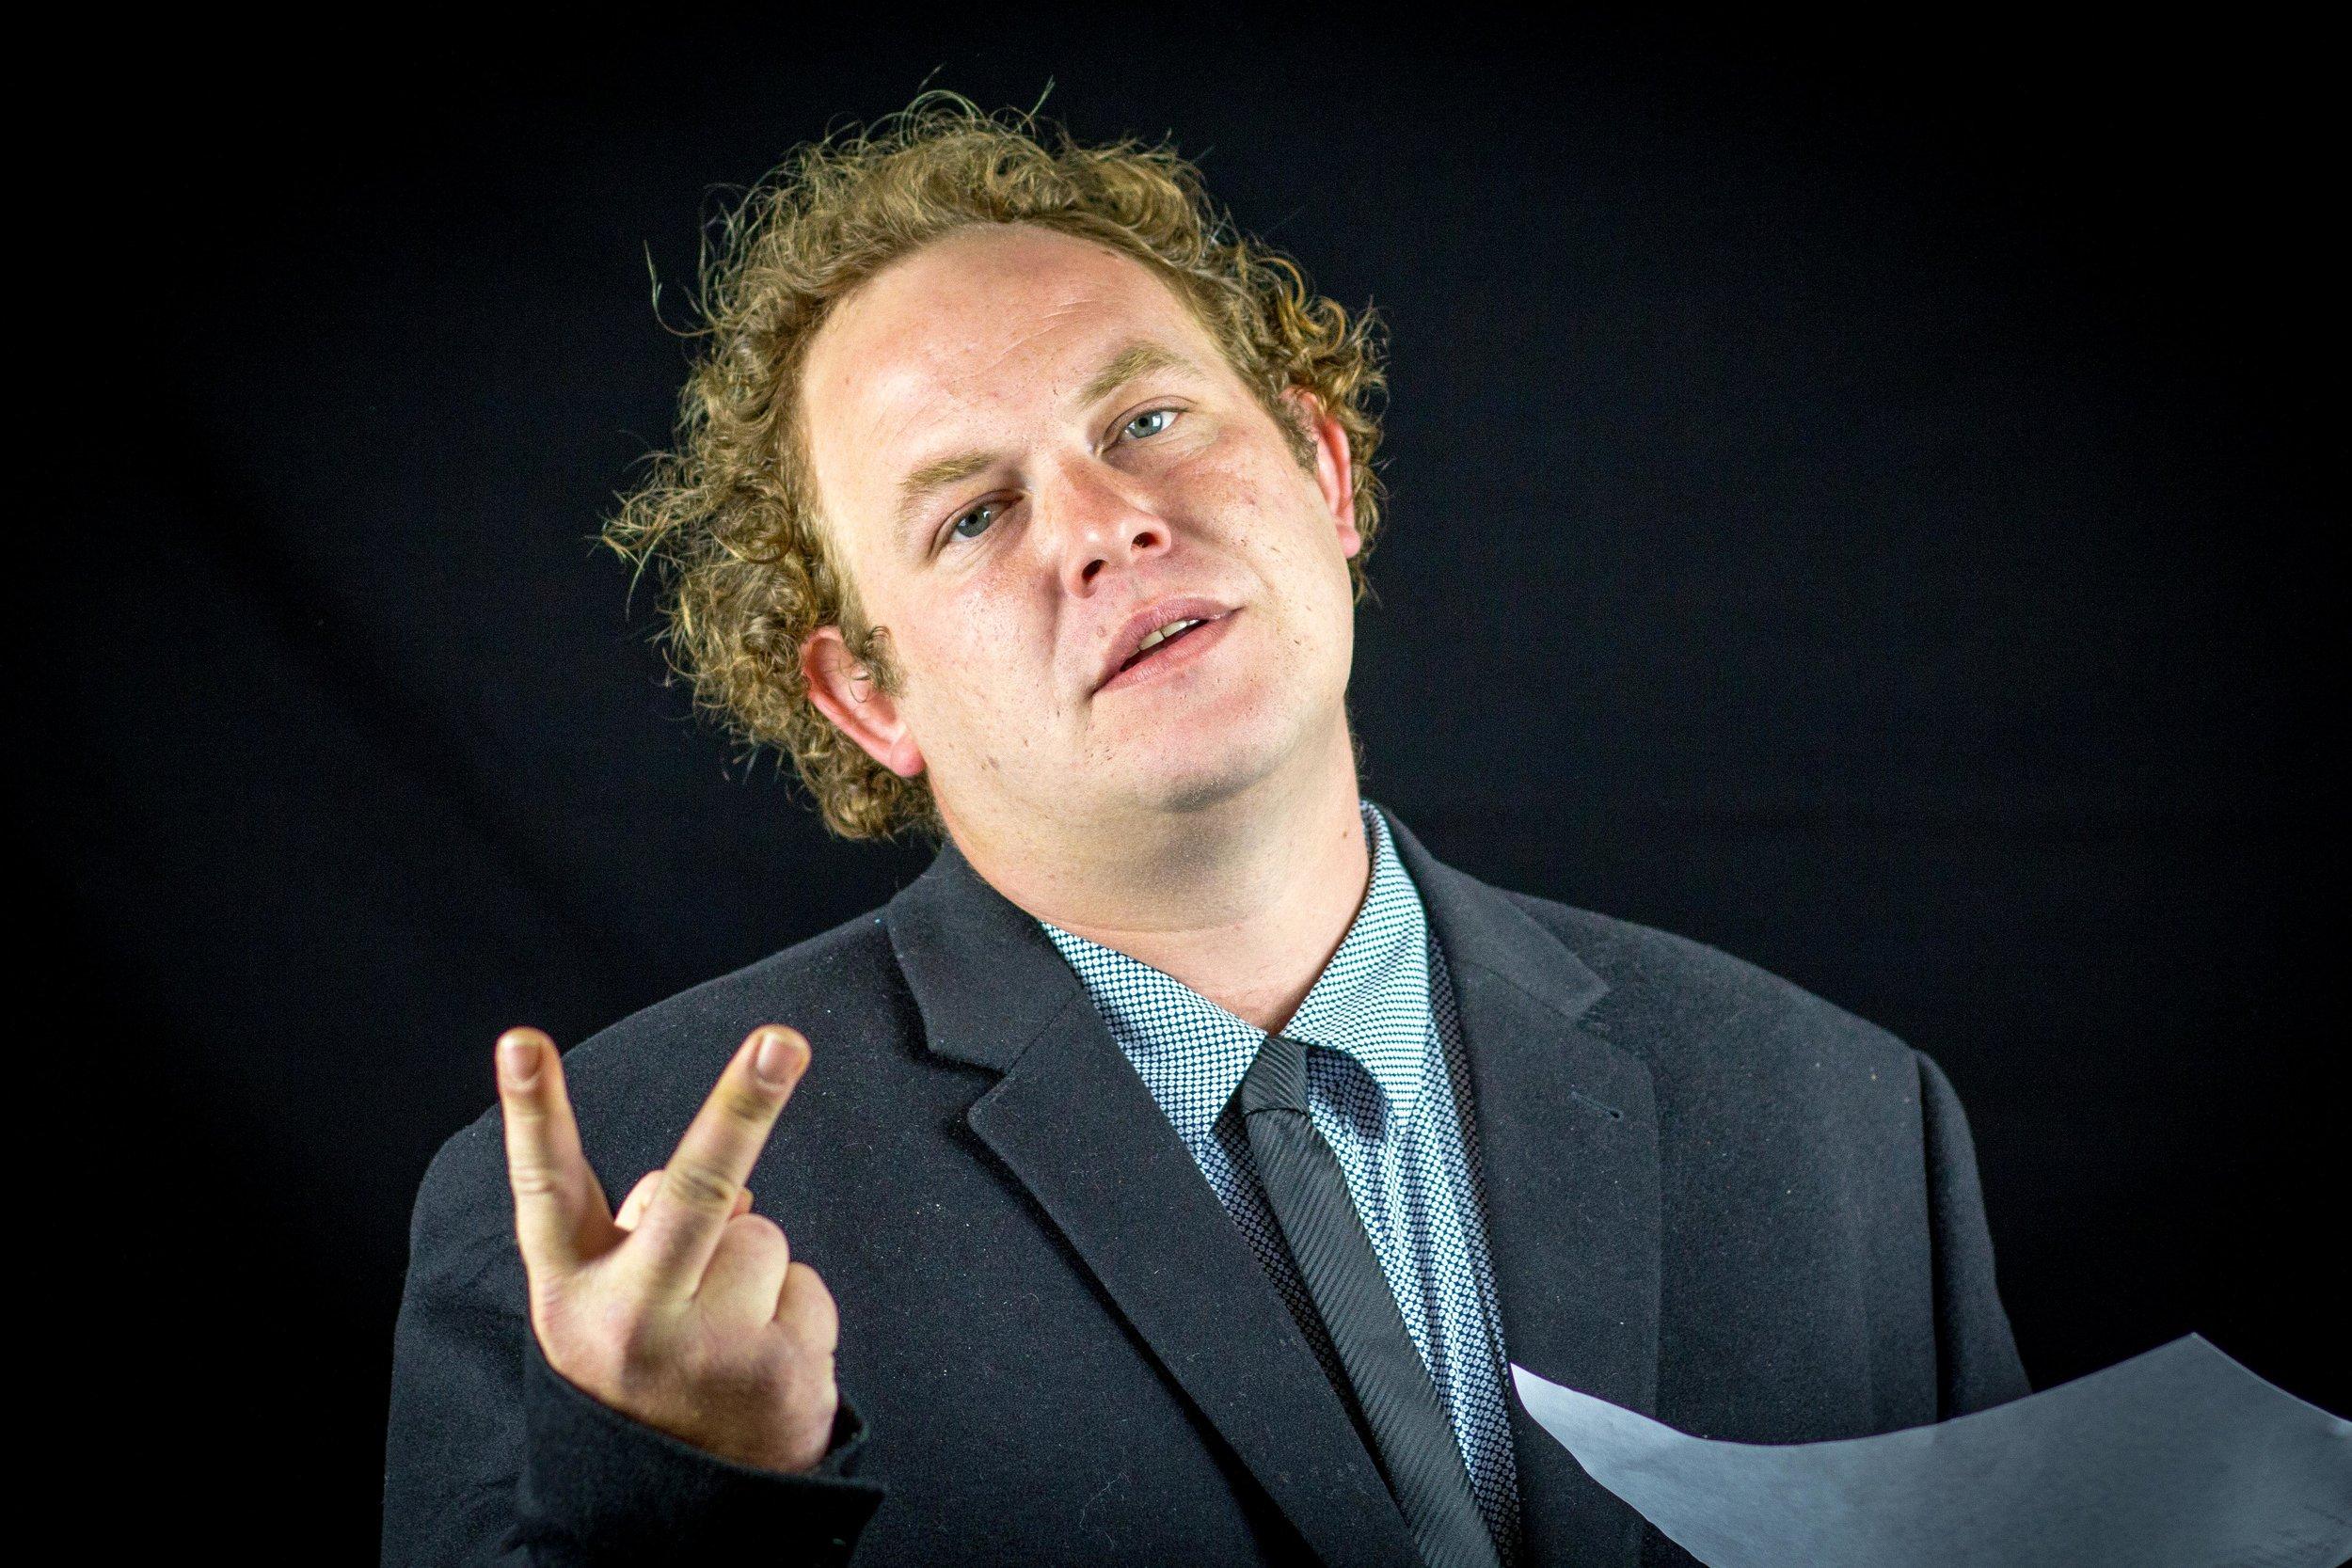 Cameron Thomas performing in Things I Hate (1).jpg